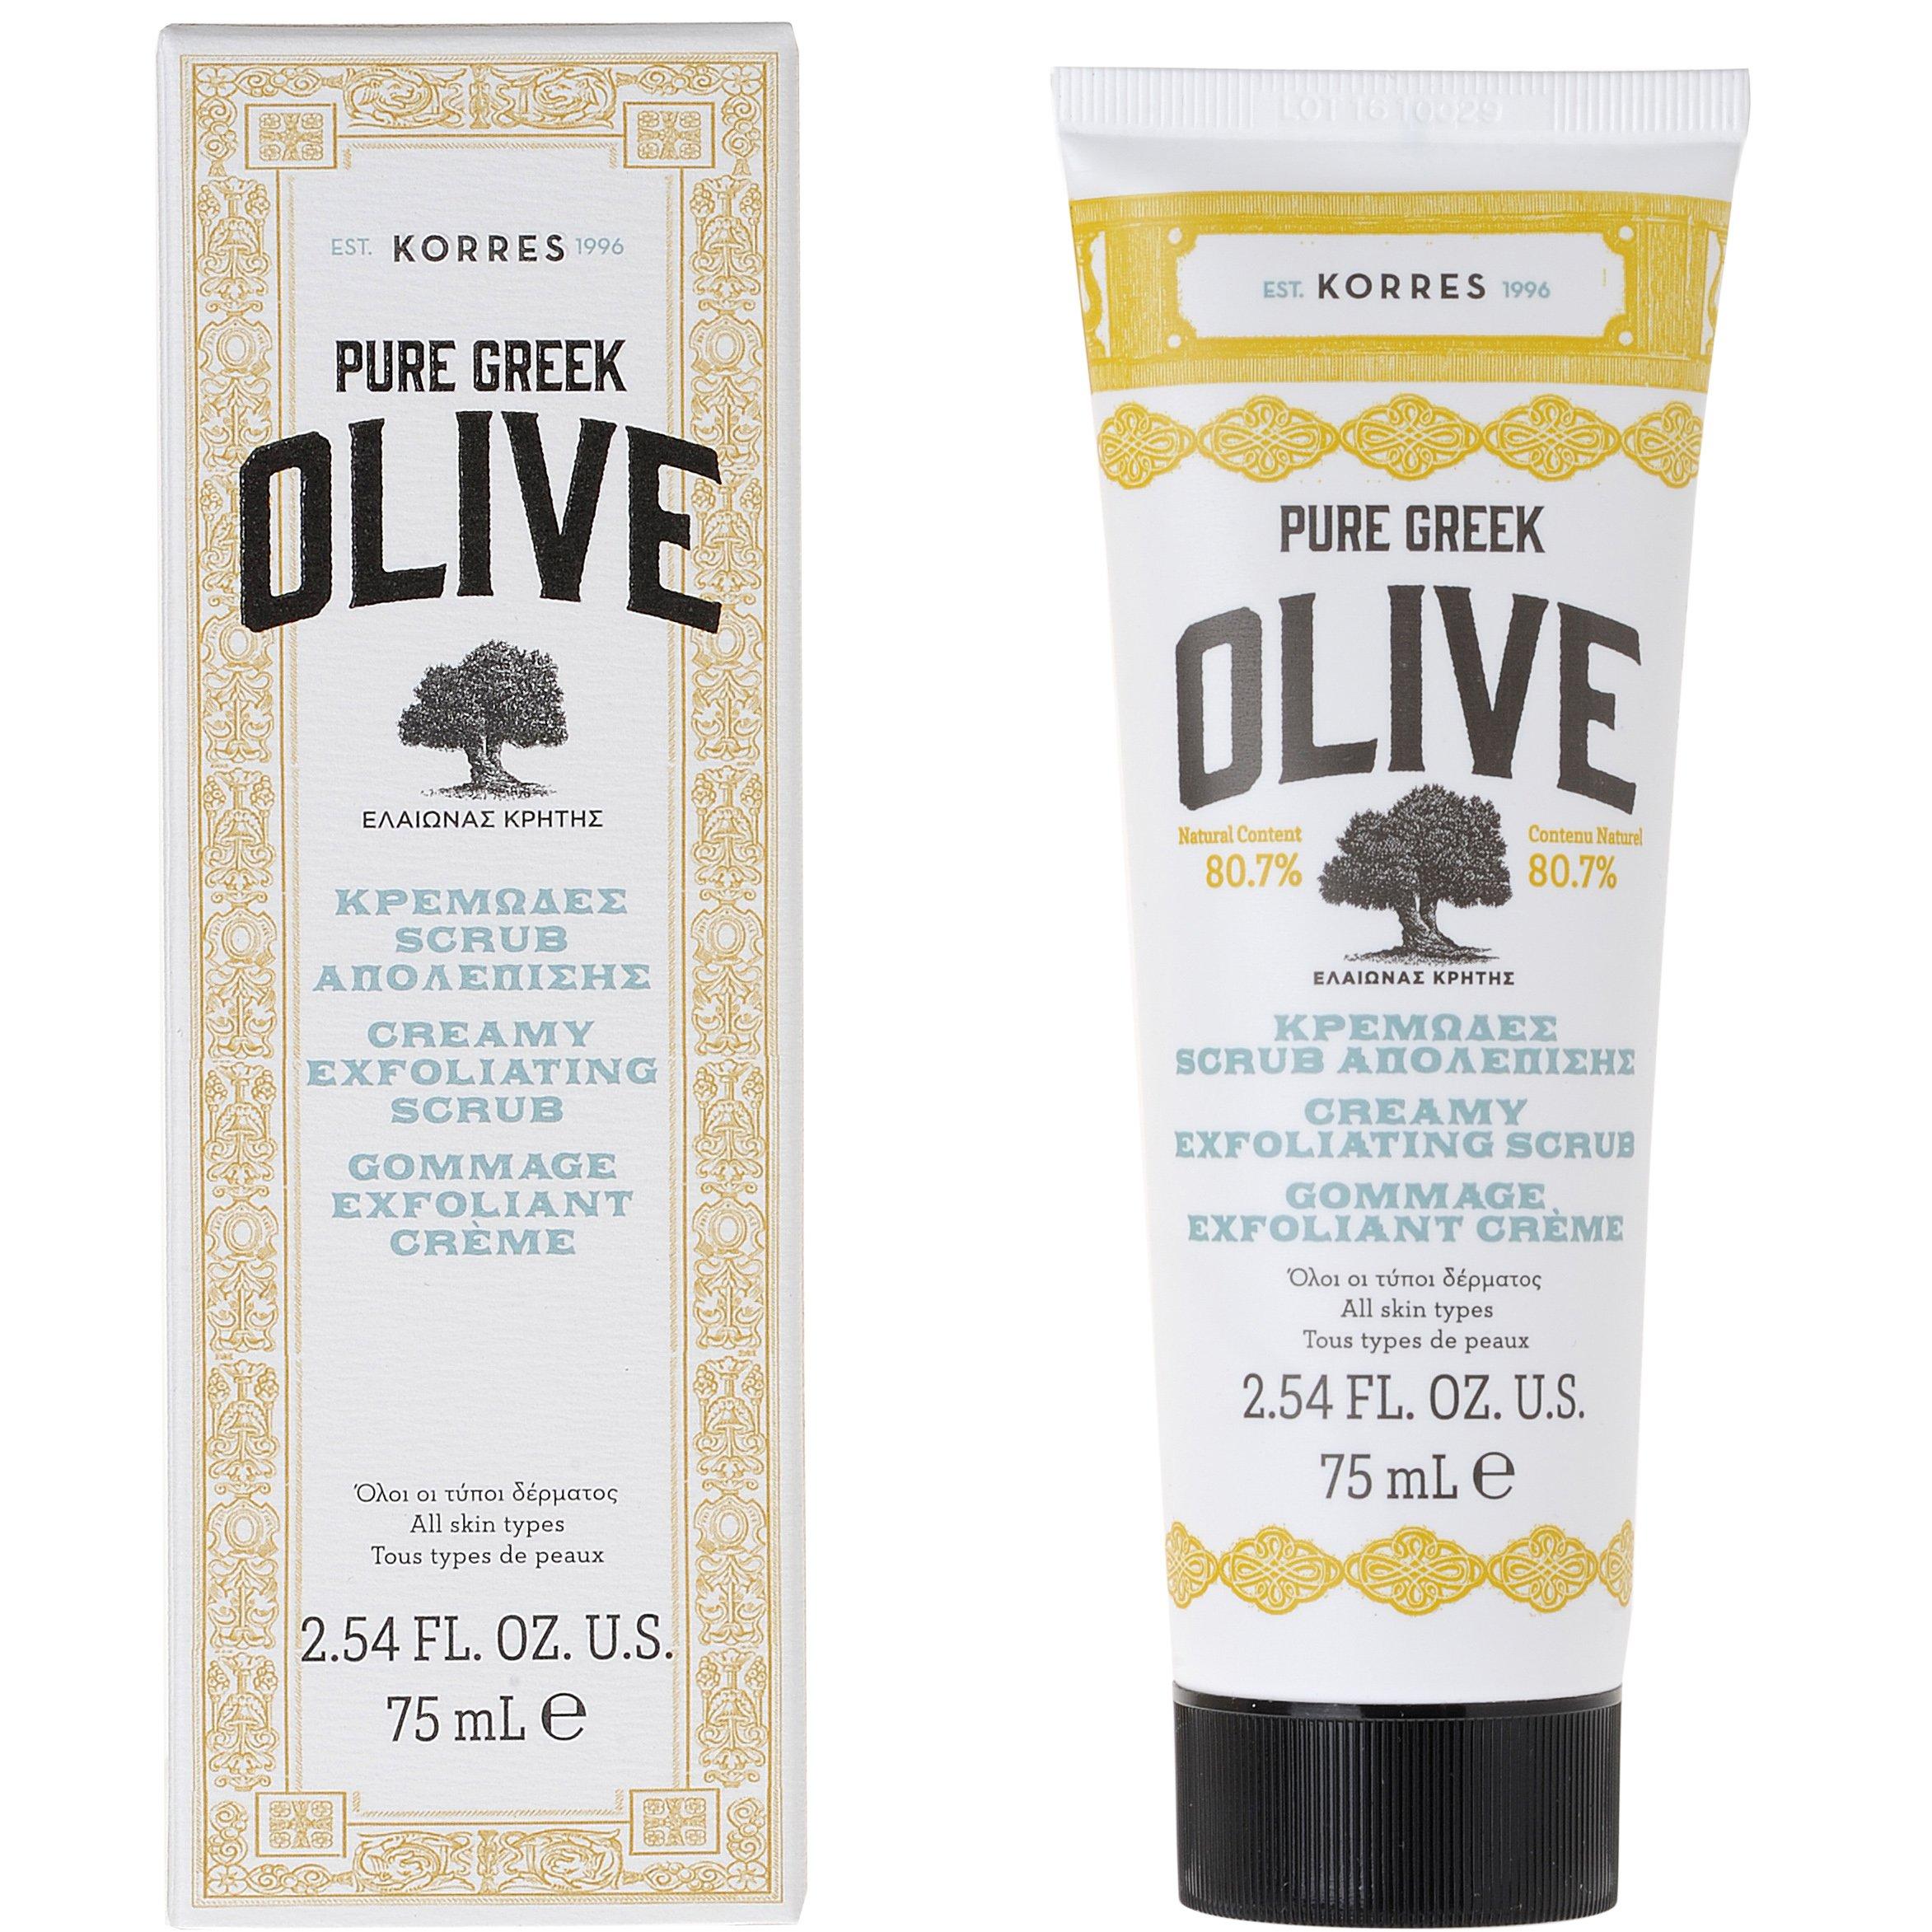 Korres Pure Greek Olive Κρεμώδες Scrub Απολέπισης Προσώπου 75ml